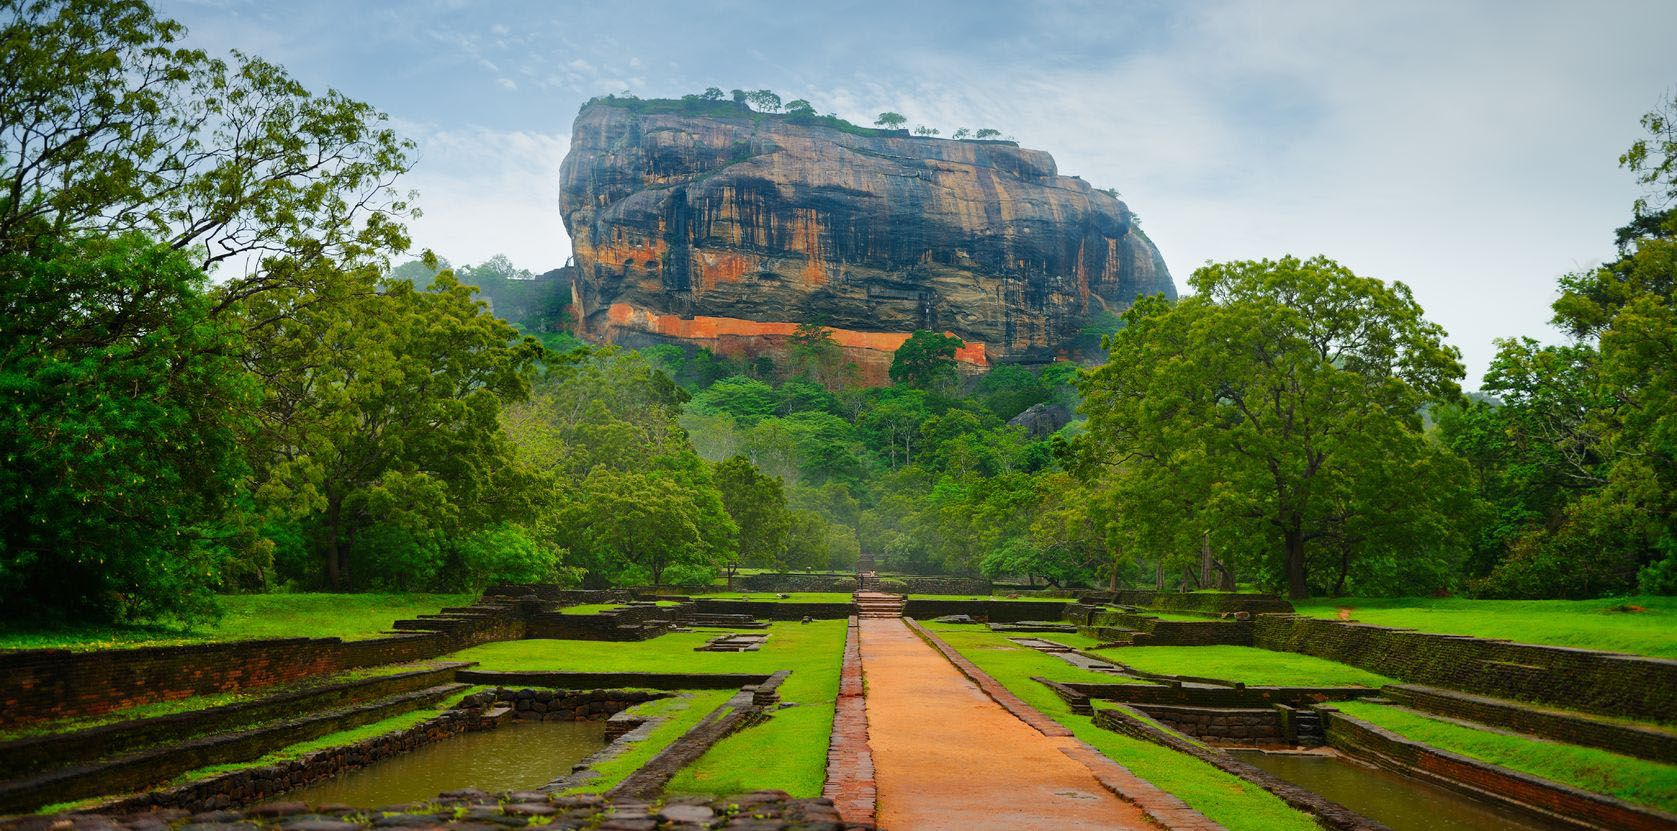 Vue sur le rocher de Sigiriya